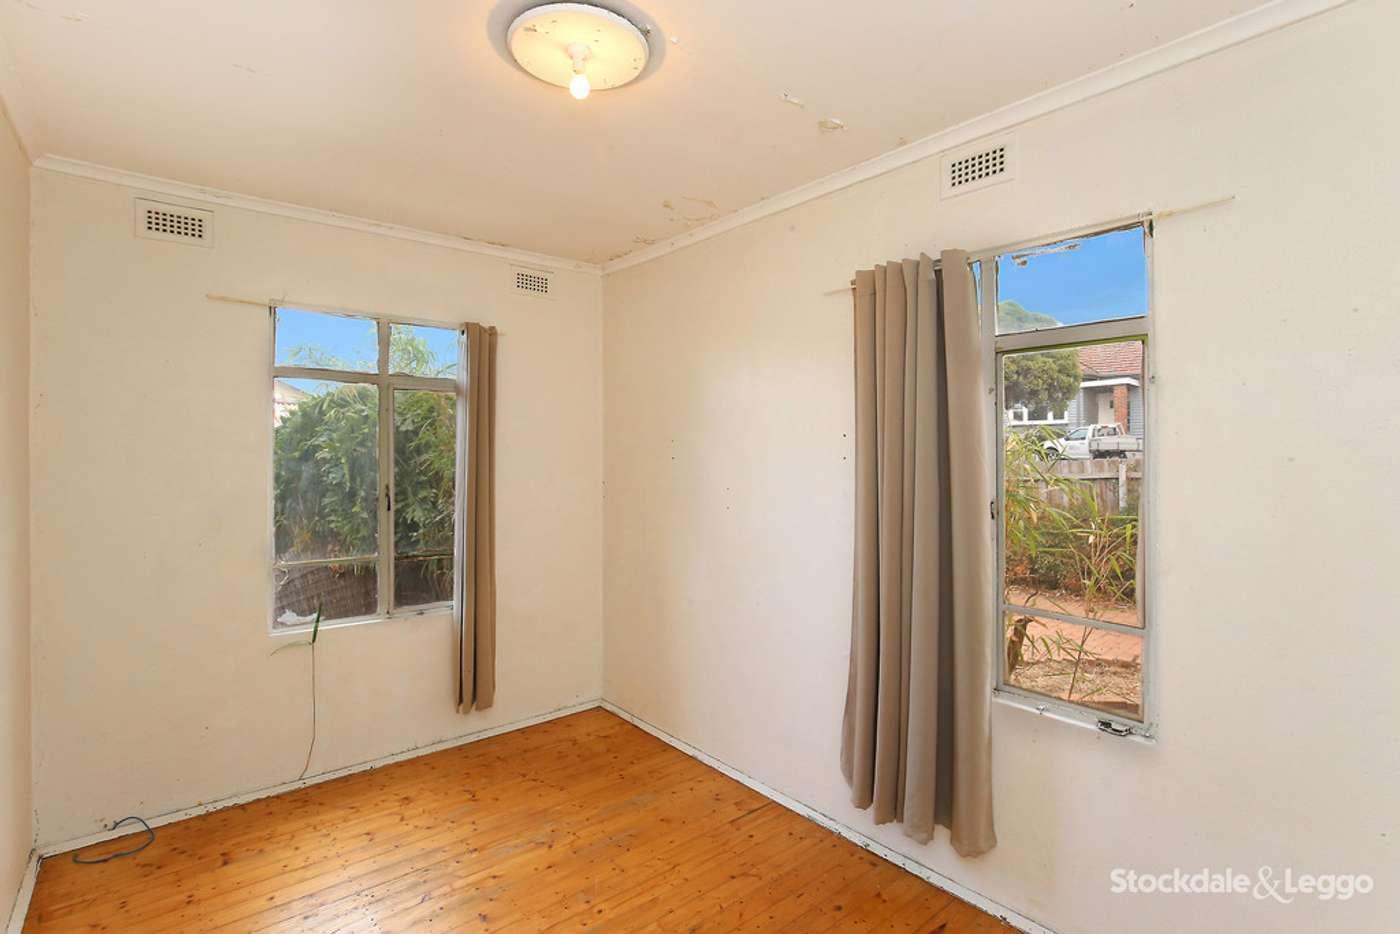 Seventh view of Homely house listing, 2 & 4 Tiernan Street, Preston VIC 3072